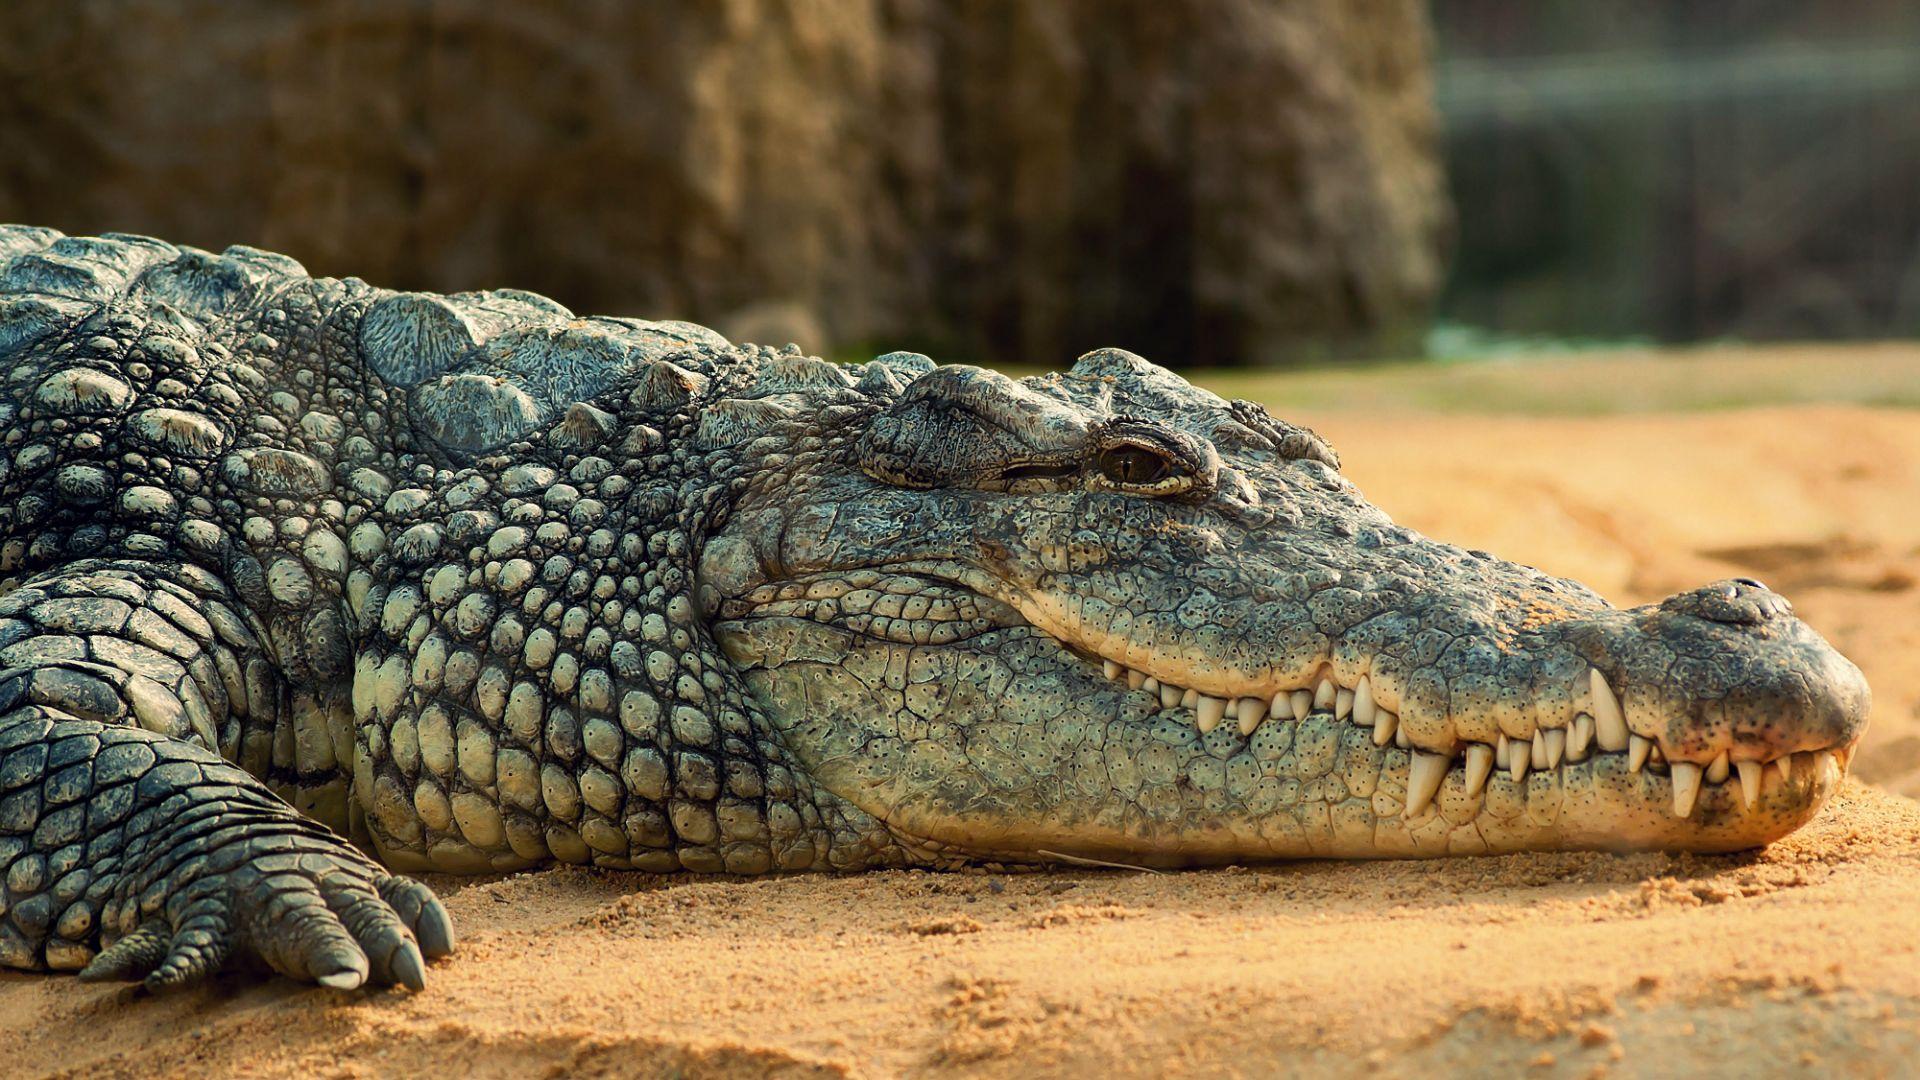 Nile Crocodile Pictures